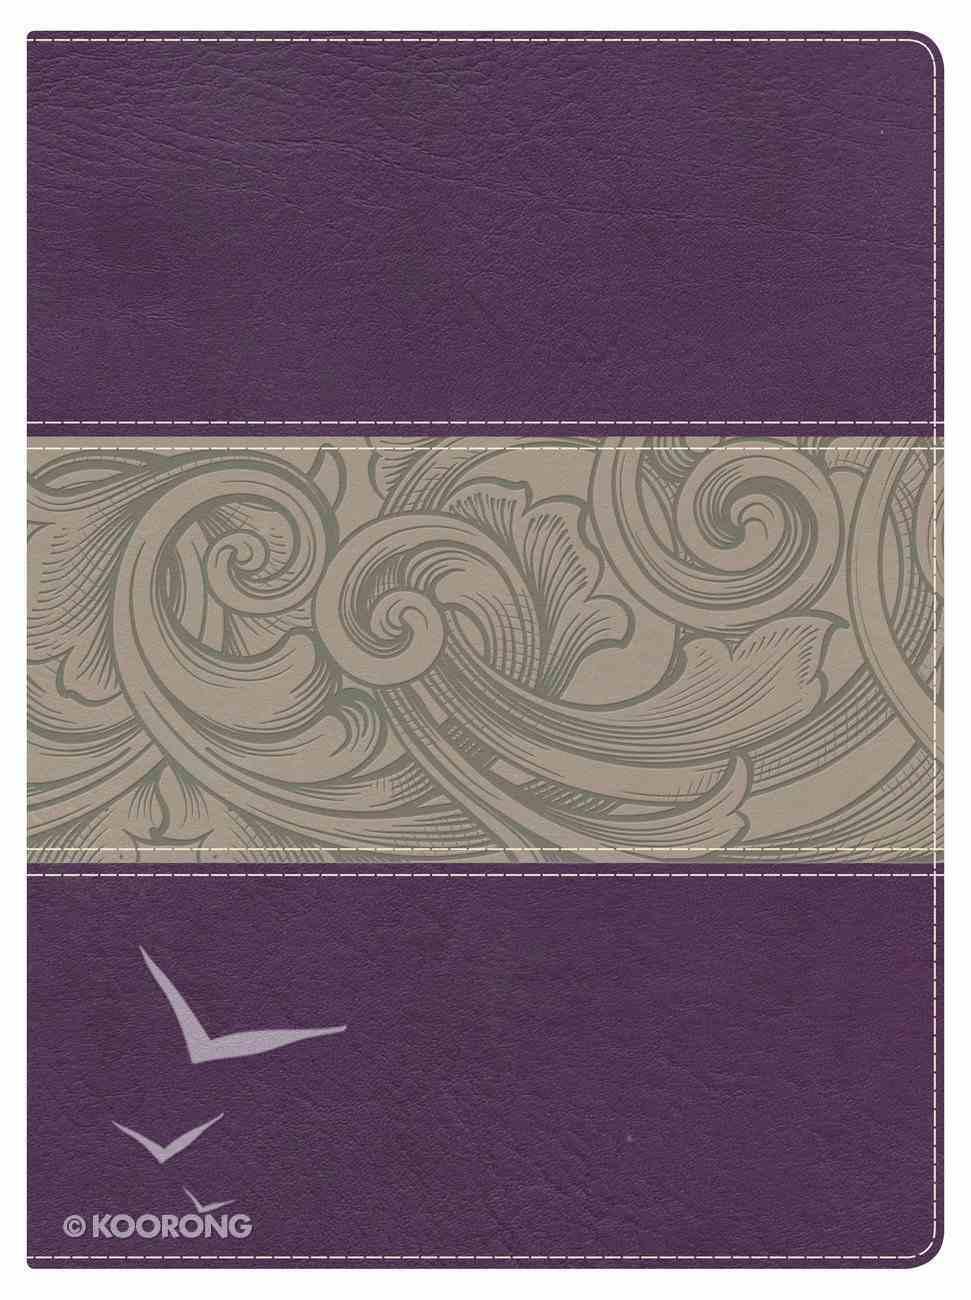 NKJV Holman Study Bible Eggplant/Tan Indexed Imitation Leather